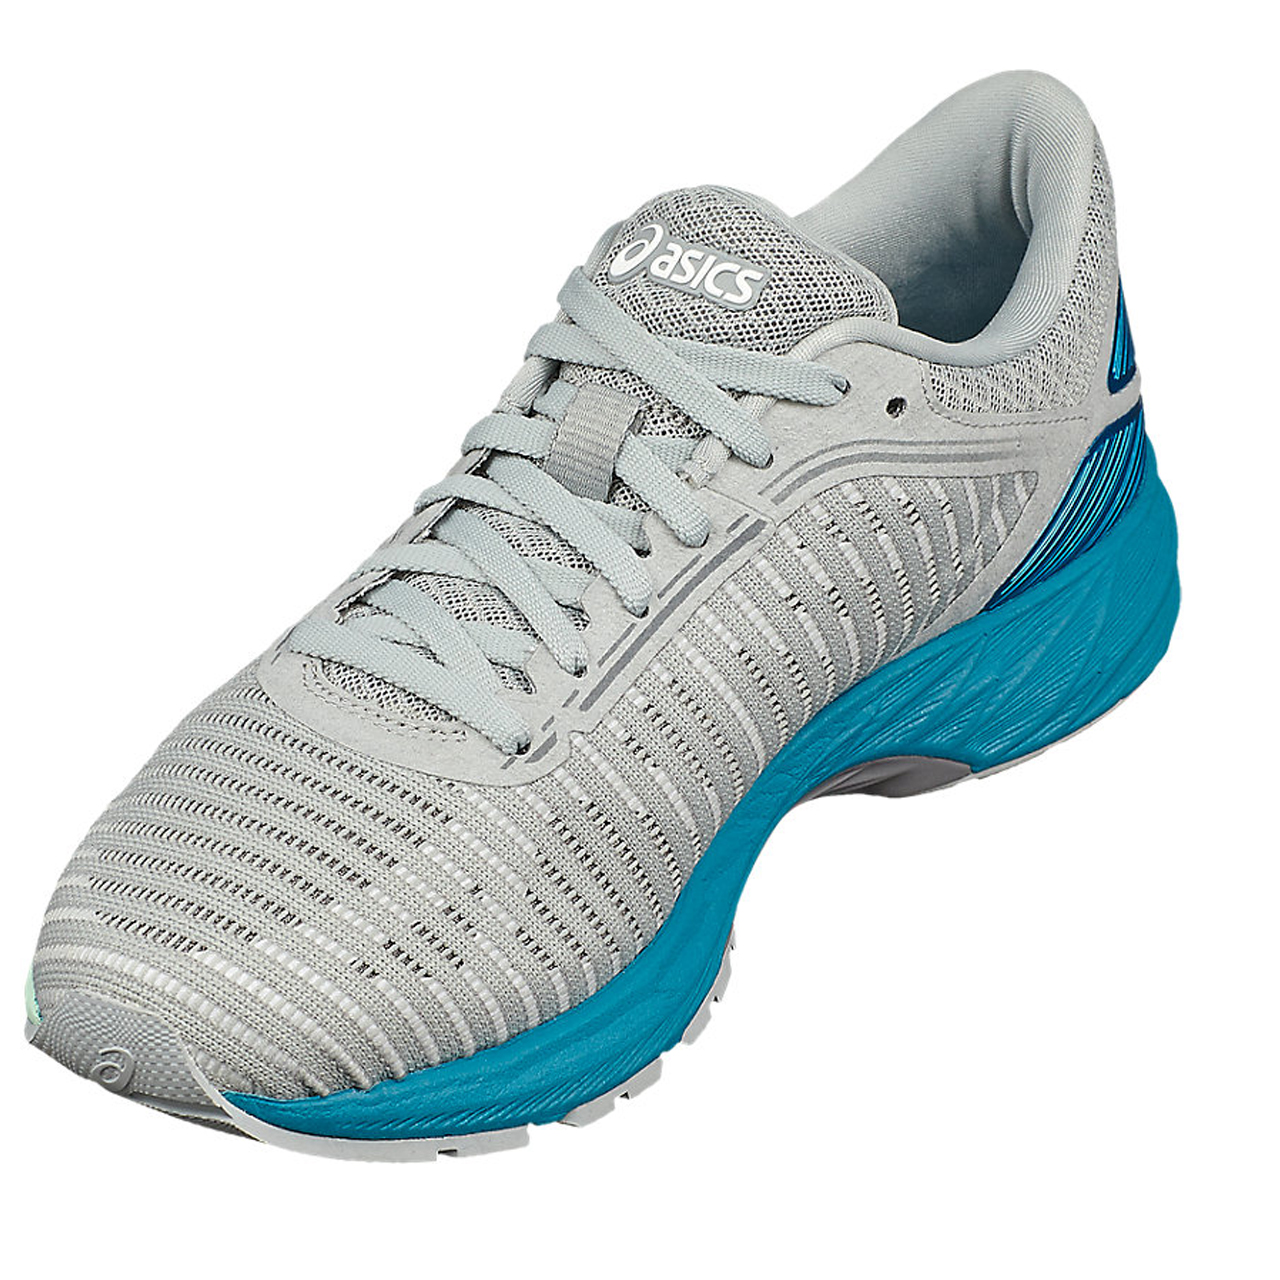 کفش مخصوص دویدن نه اسیکس مدل  Dyana flyte